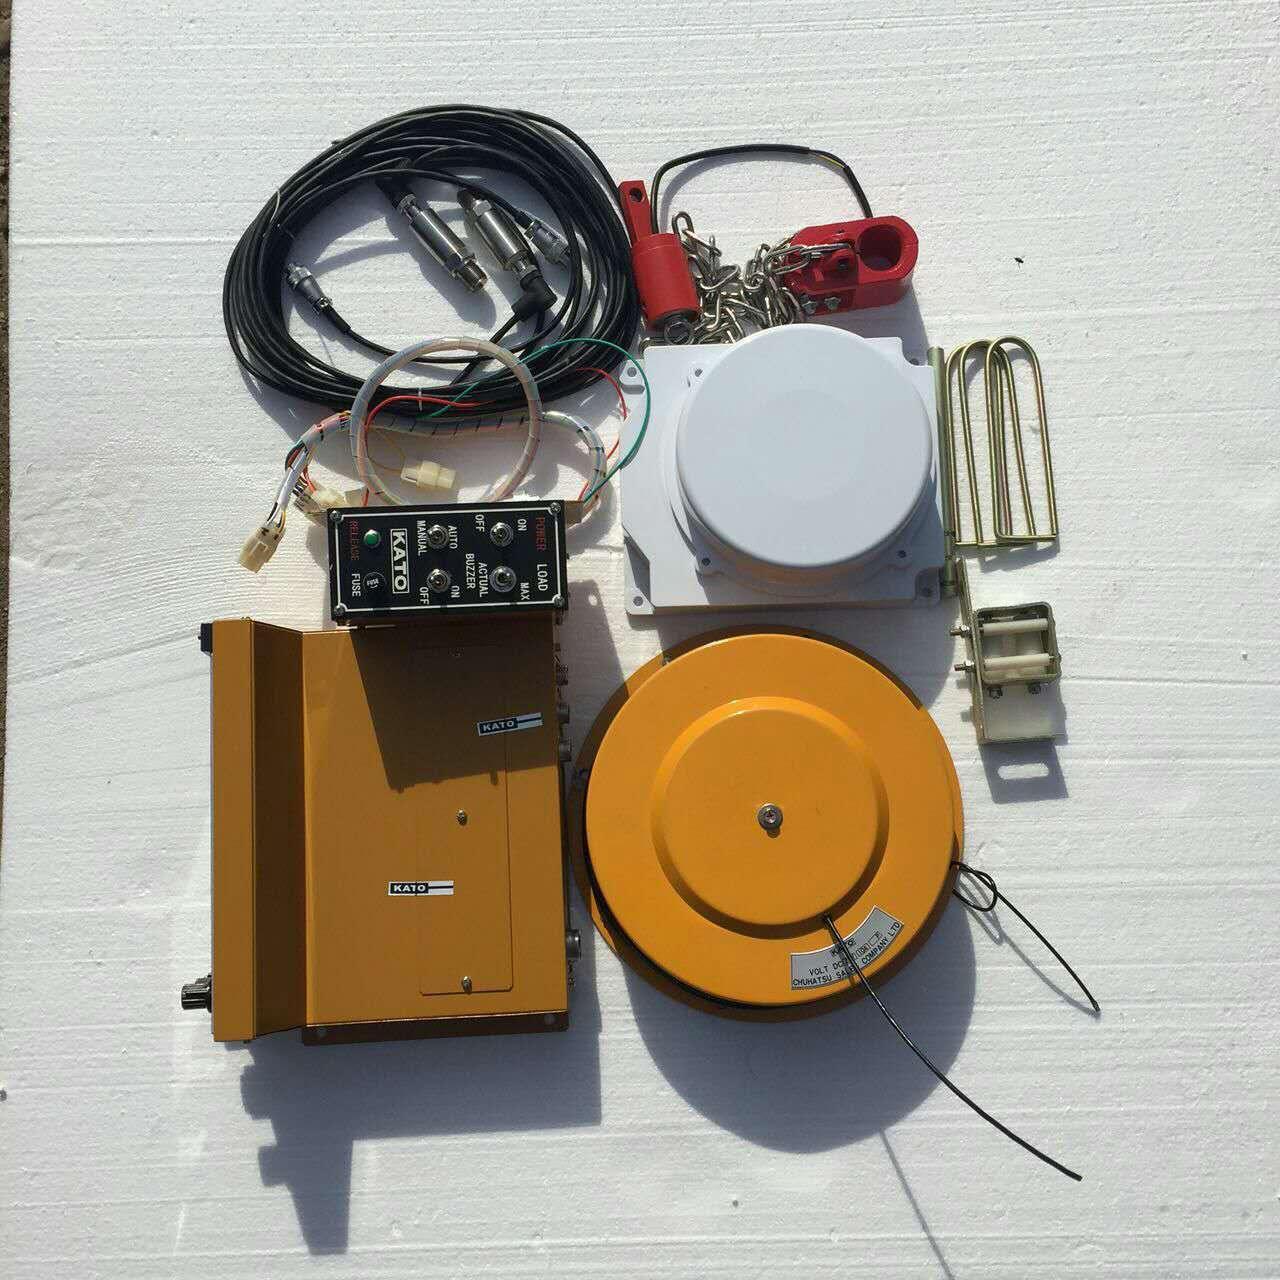 Used Crane Spare Parts : Brand new kato crane computer full set